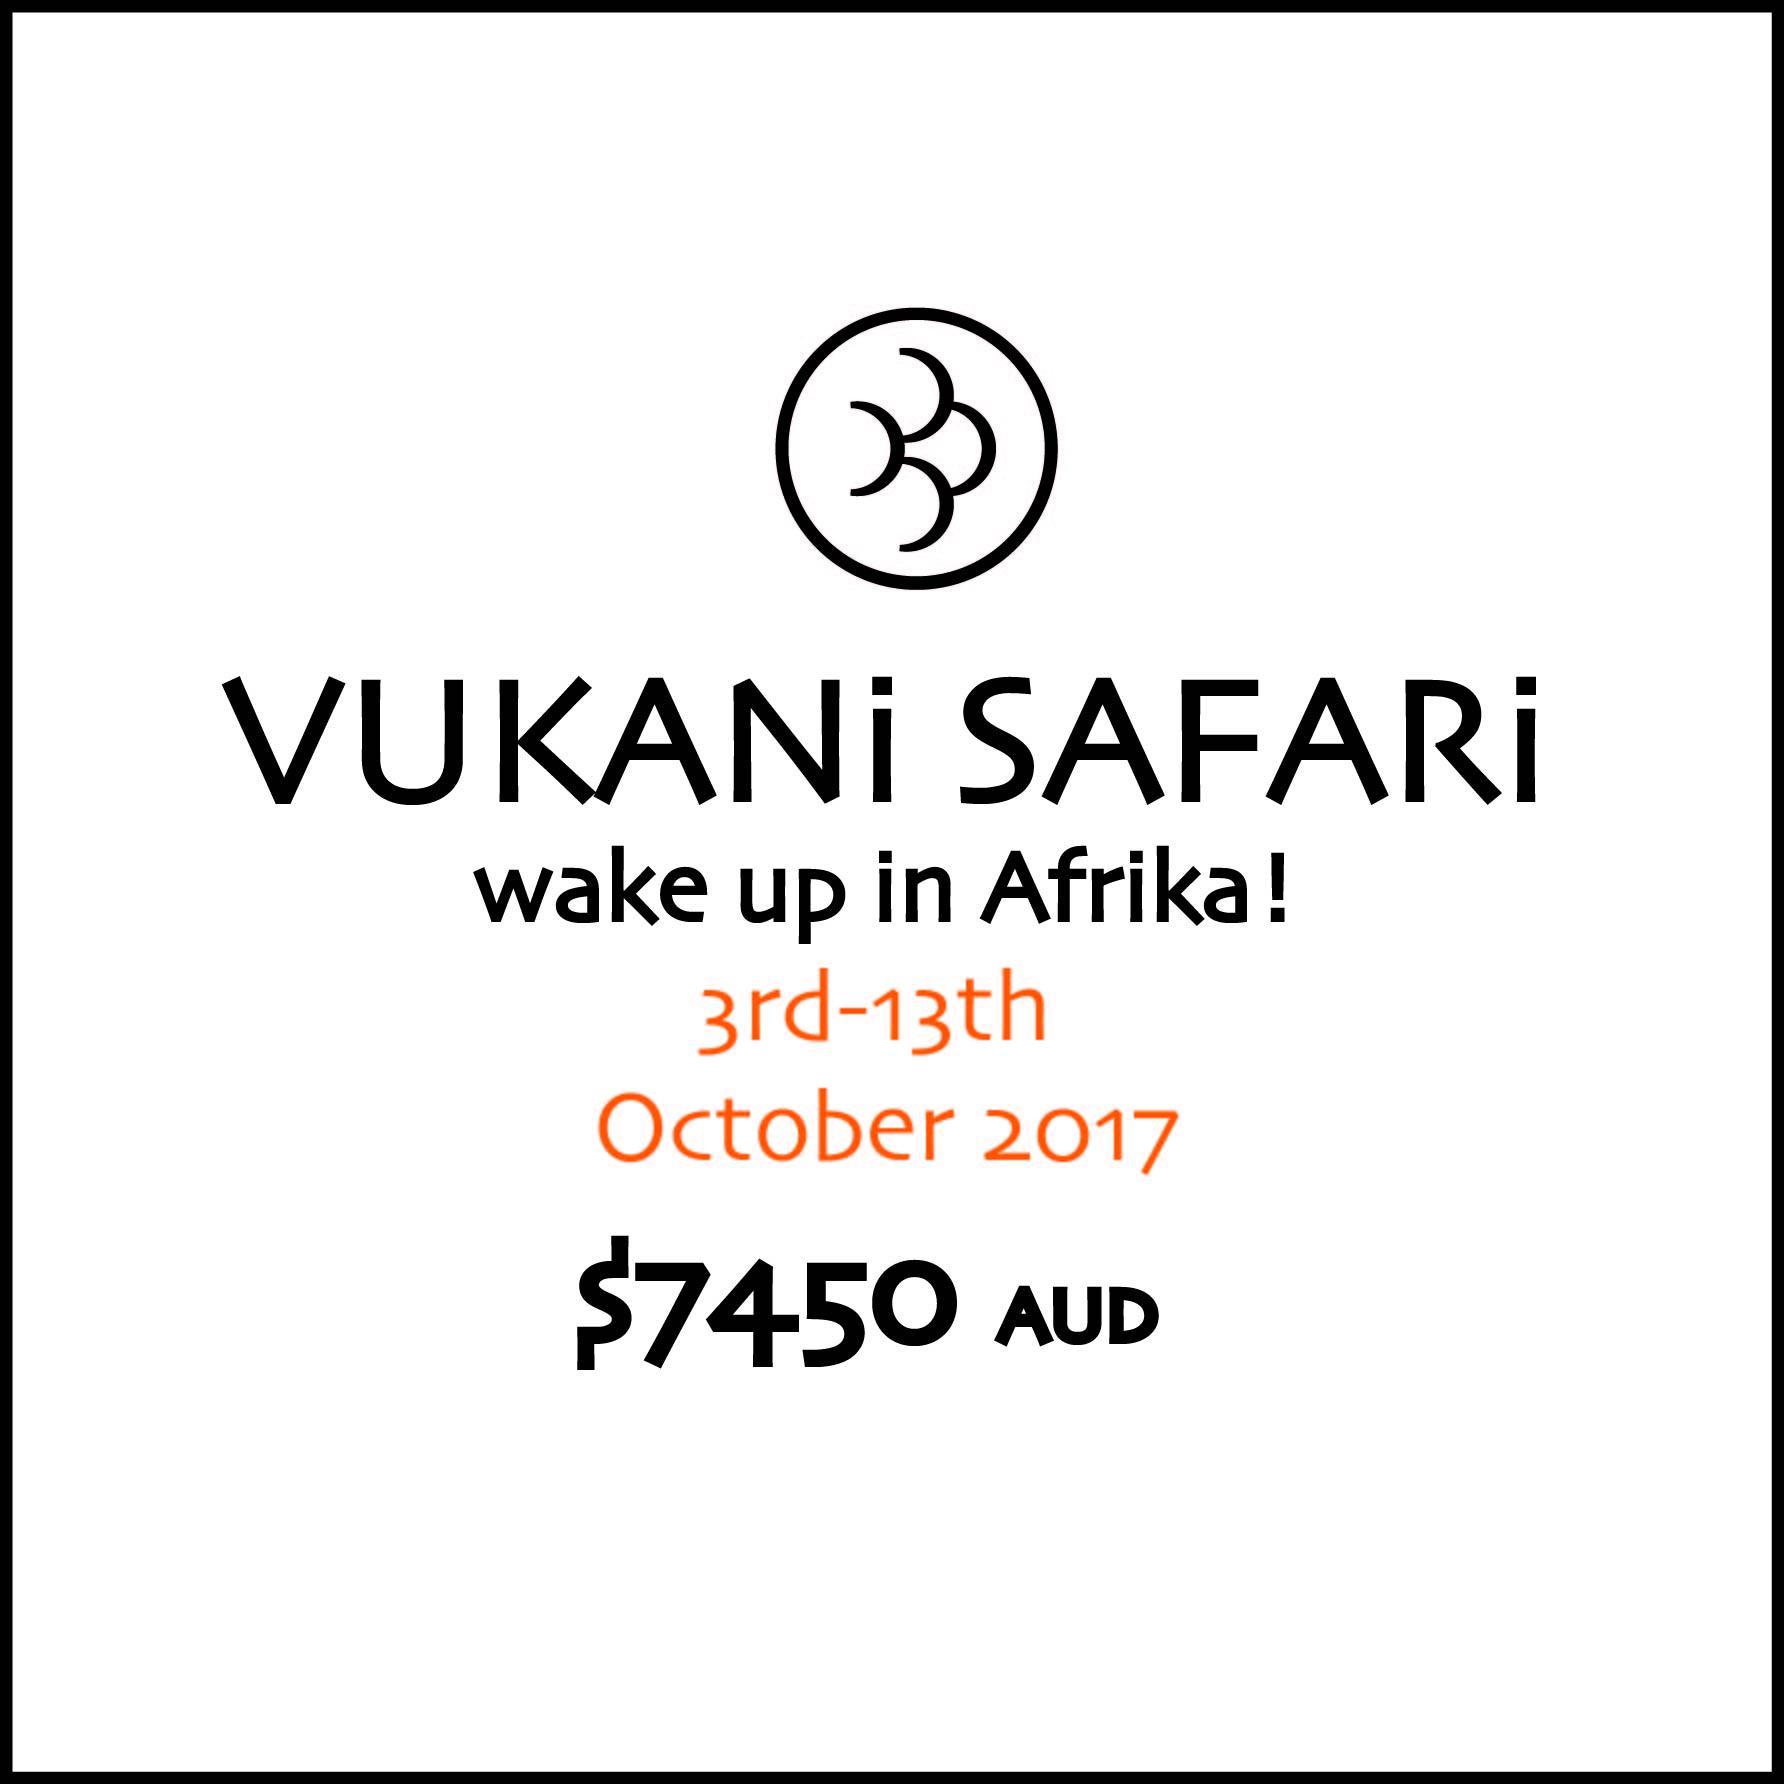 Vukani Safari Full Payment3